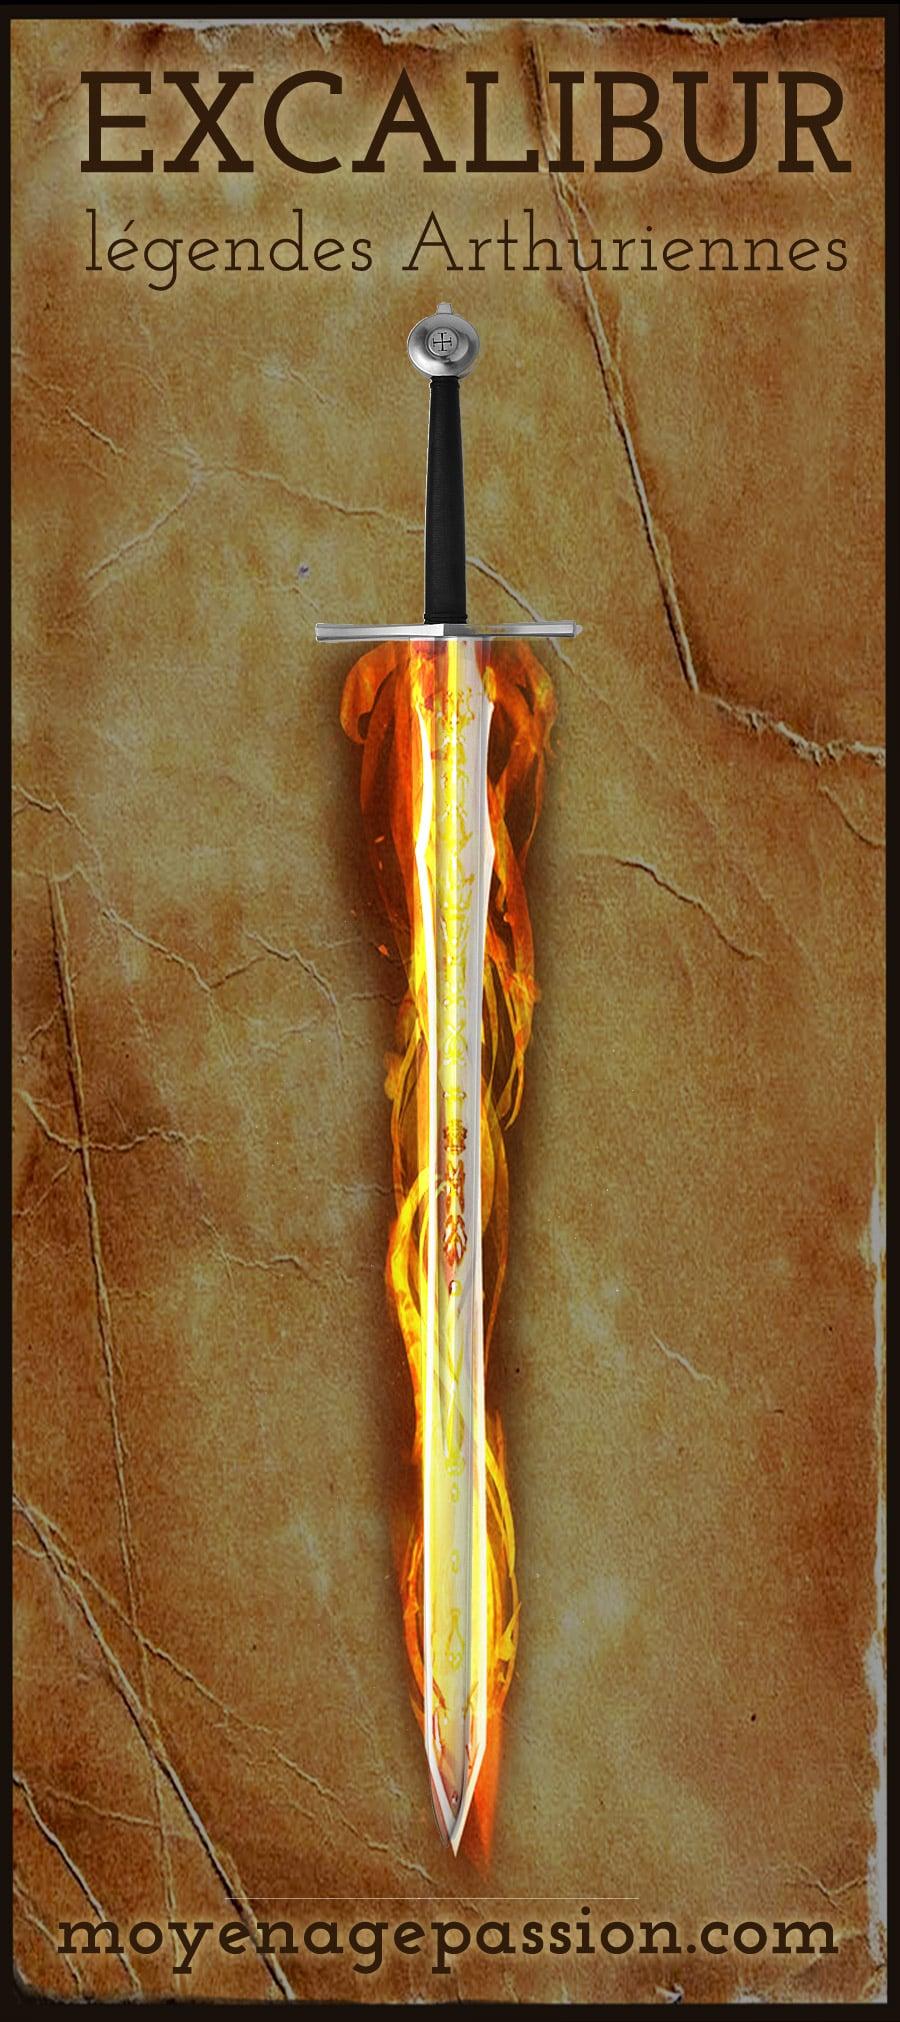 legendes_arthuriennes_excalibur_symbole_origine_archeologie